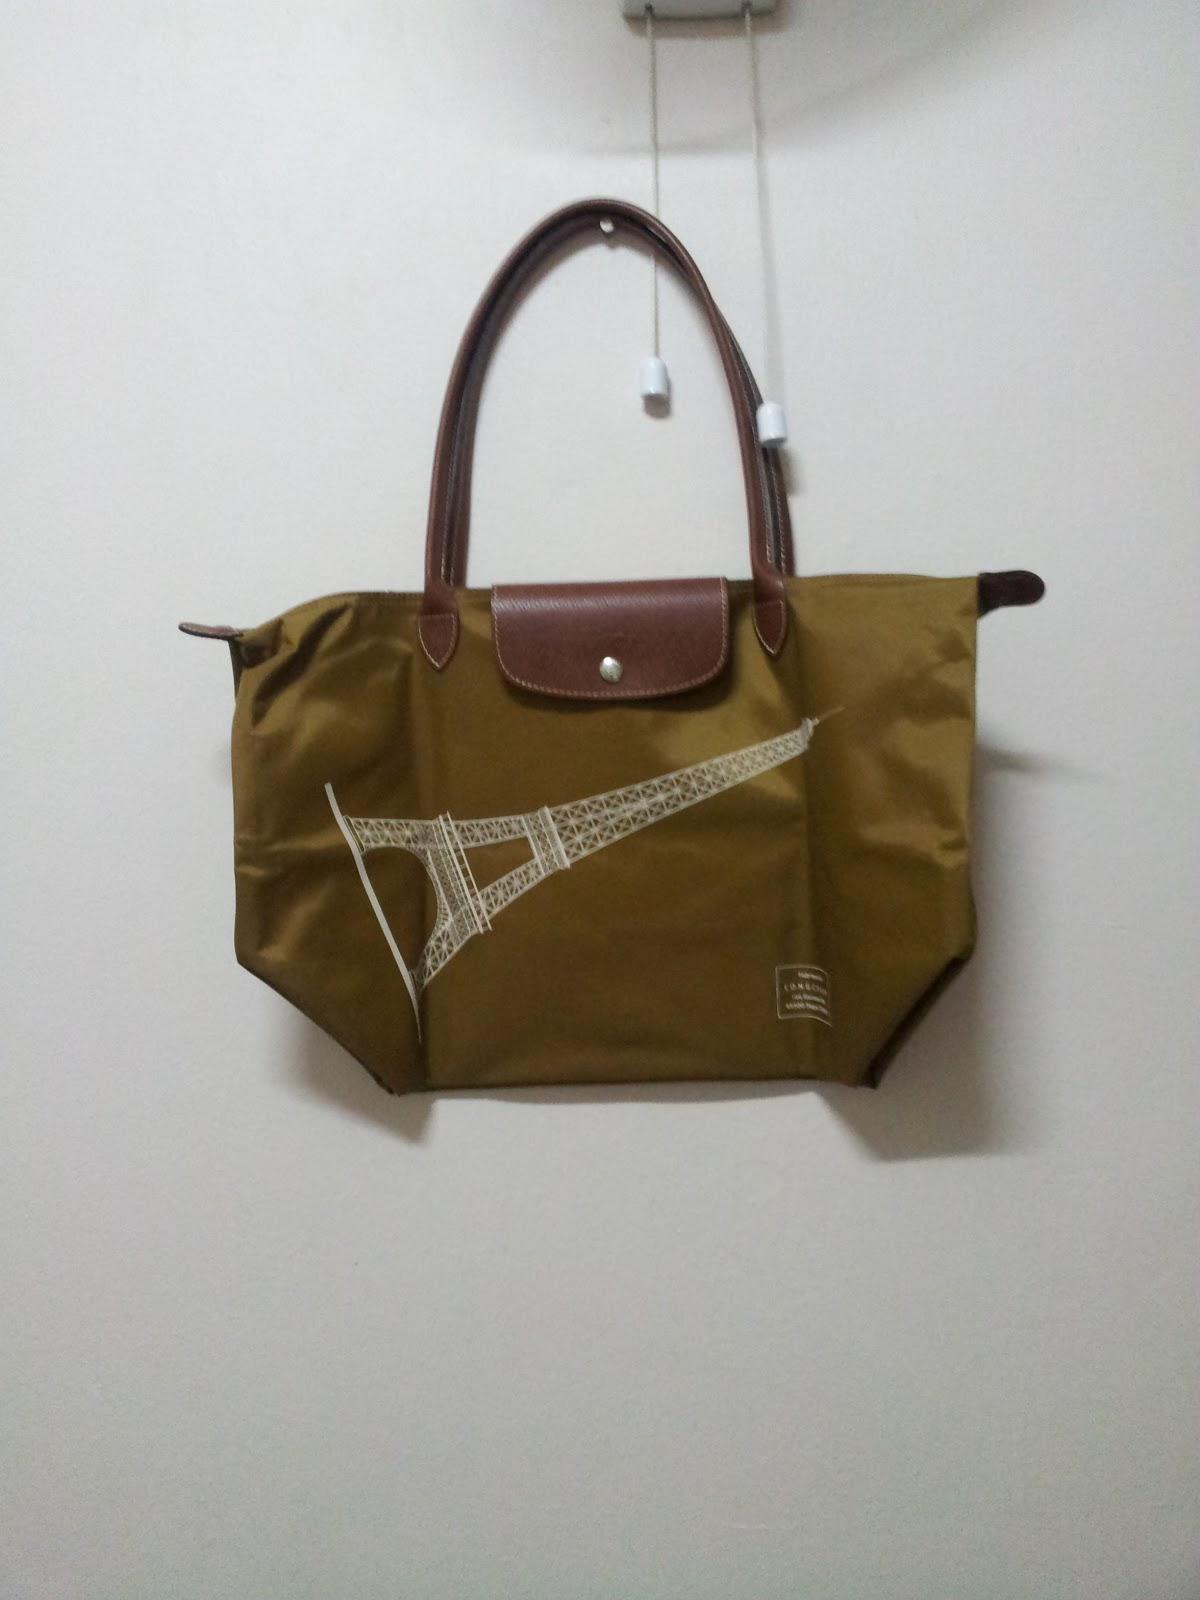 Longchamp Bag Le Pliage Australia : Authentic longchamp bags malaysia